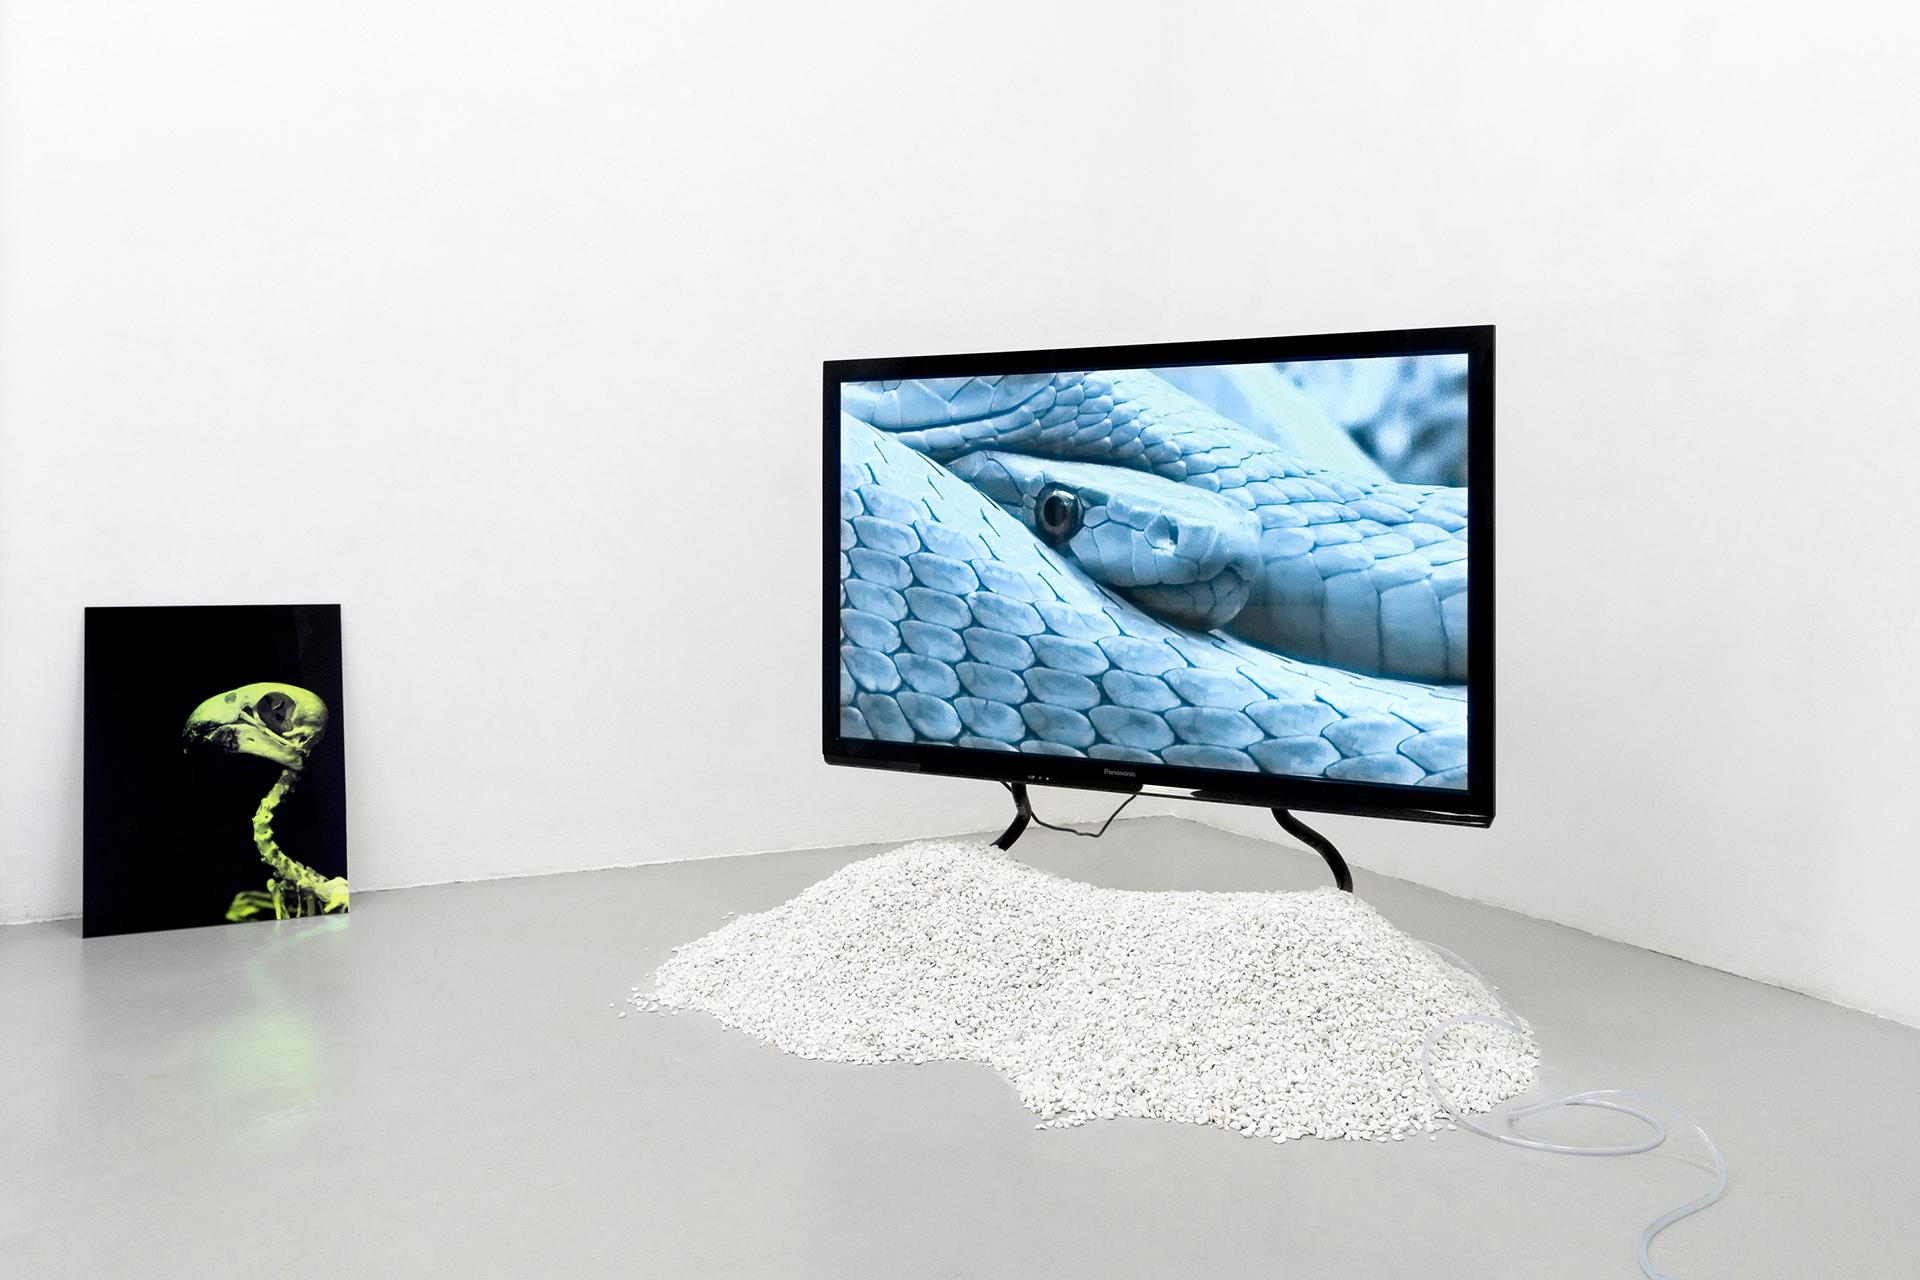 15-Paulo-Arraiano,-Sensorial-Divinities.-2019.-Exhibition-view.-Dimora-Artica-(ph-Cesare-Lopopolo).jpg